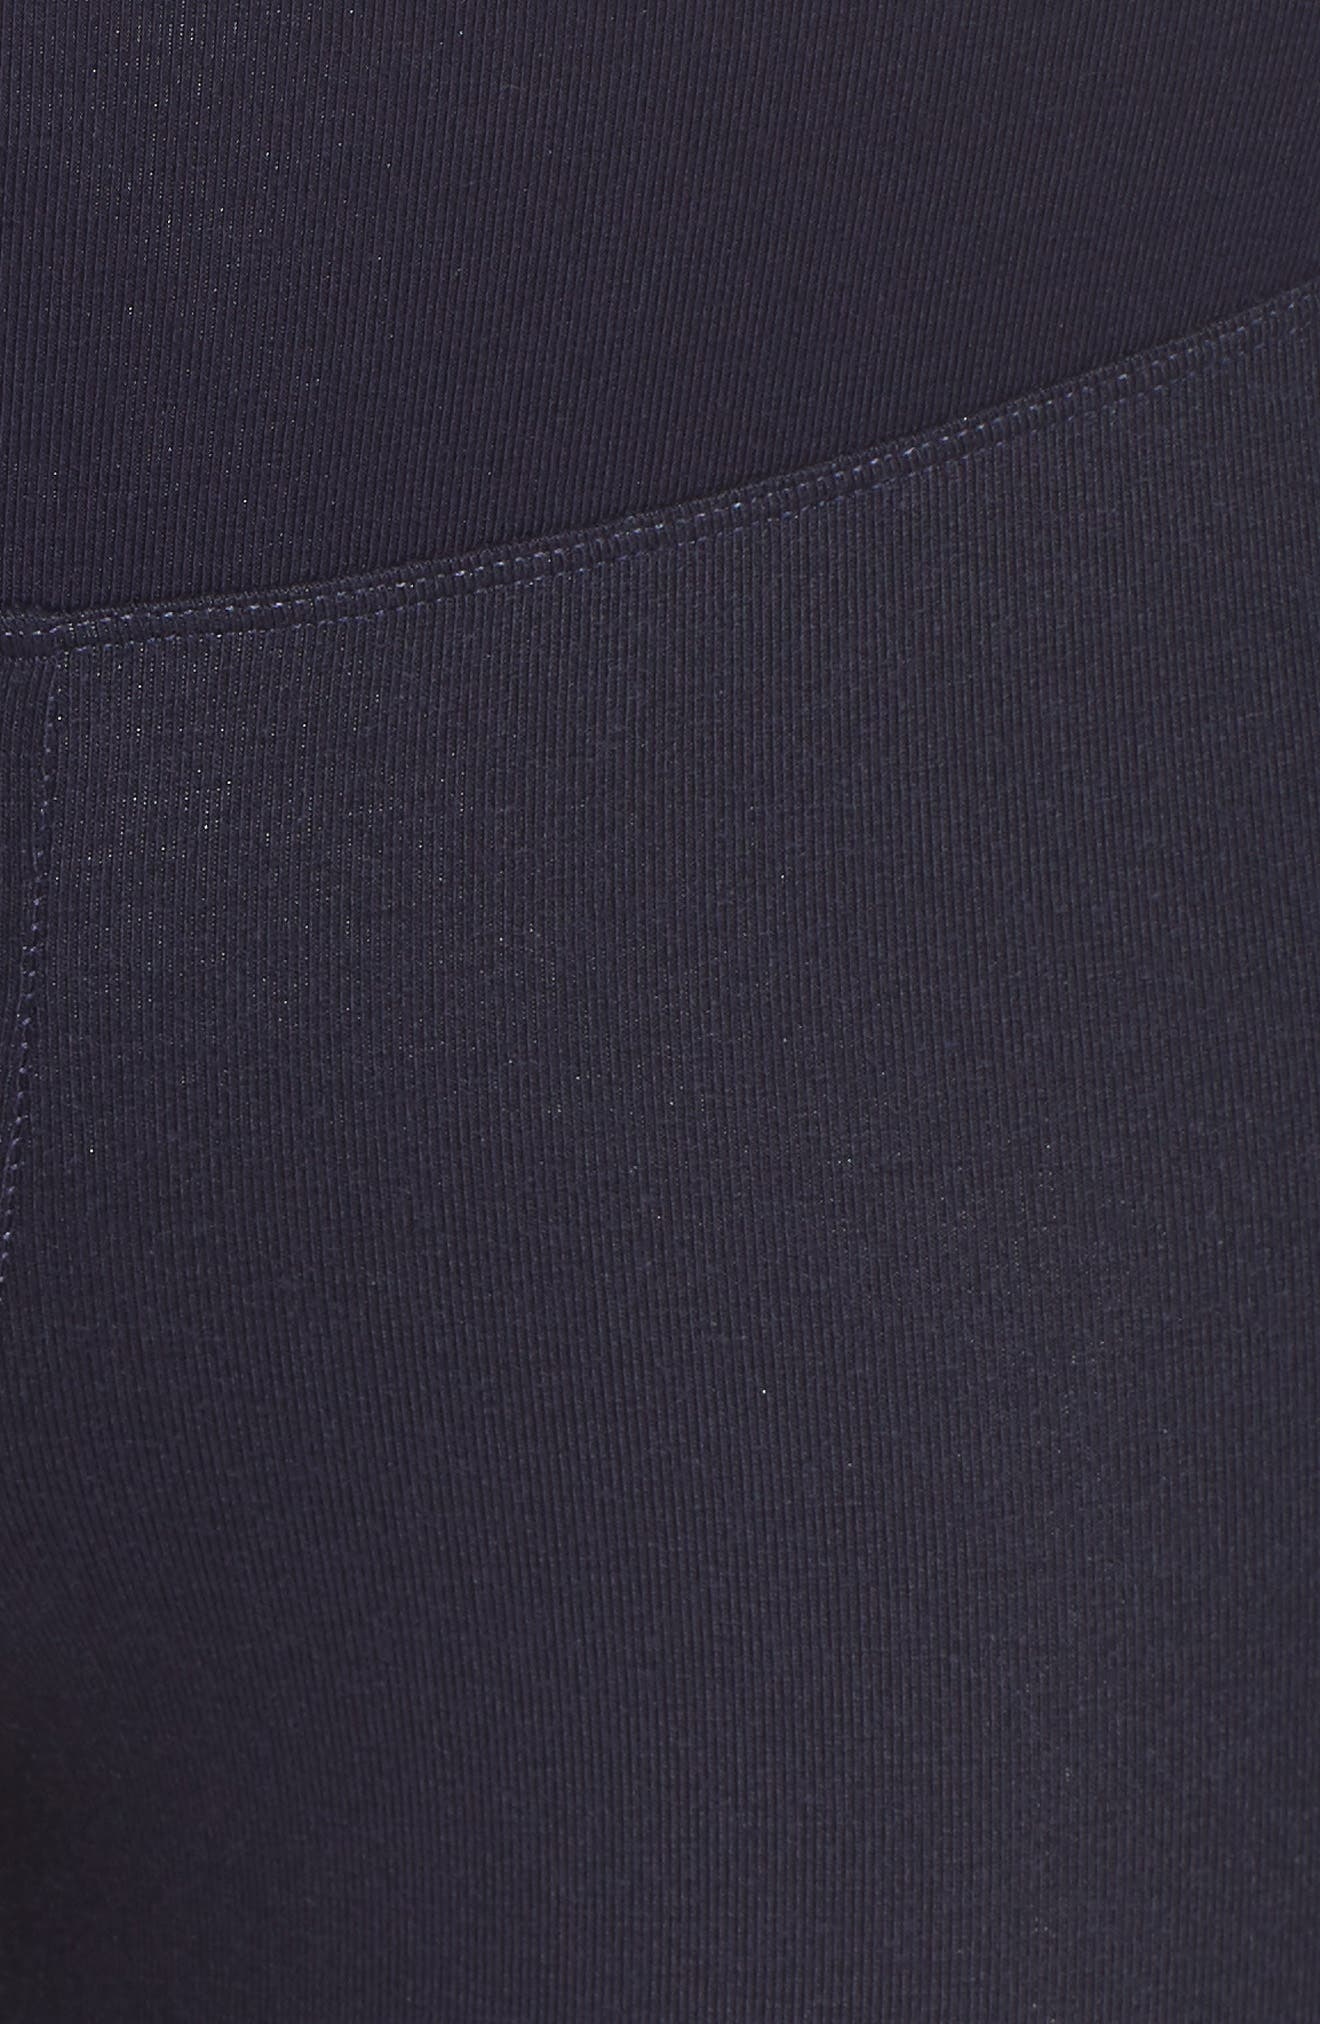 Coated Side Panel Ankle Leggings,                             Alternate thumbnail 5, color,                             Evening Blue